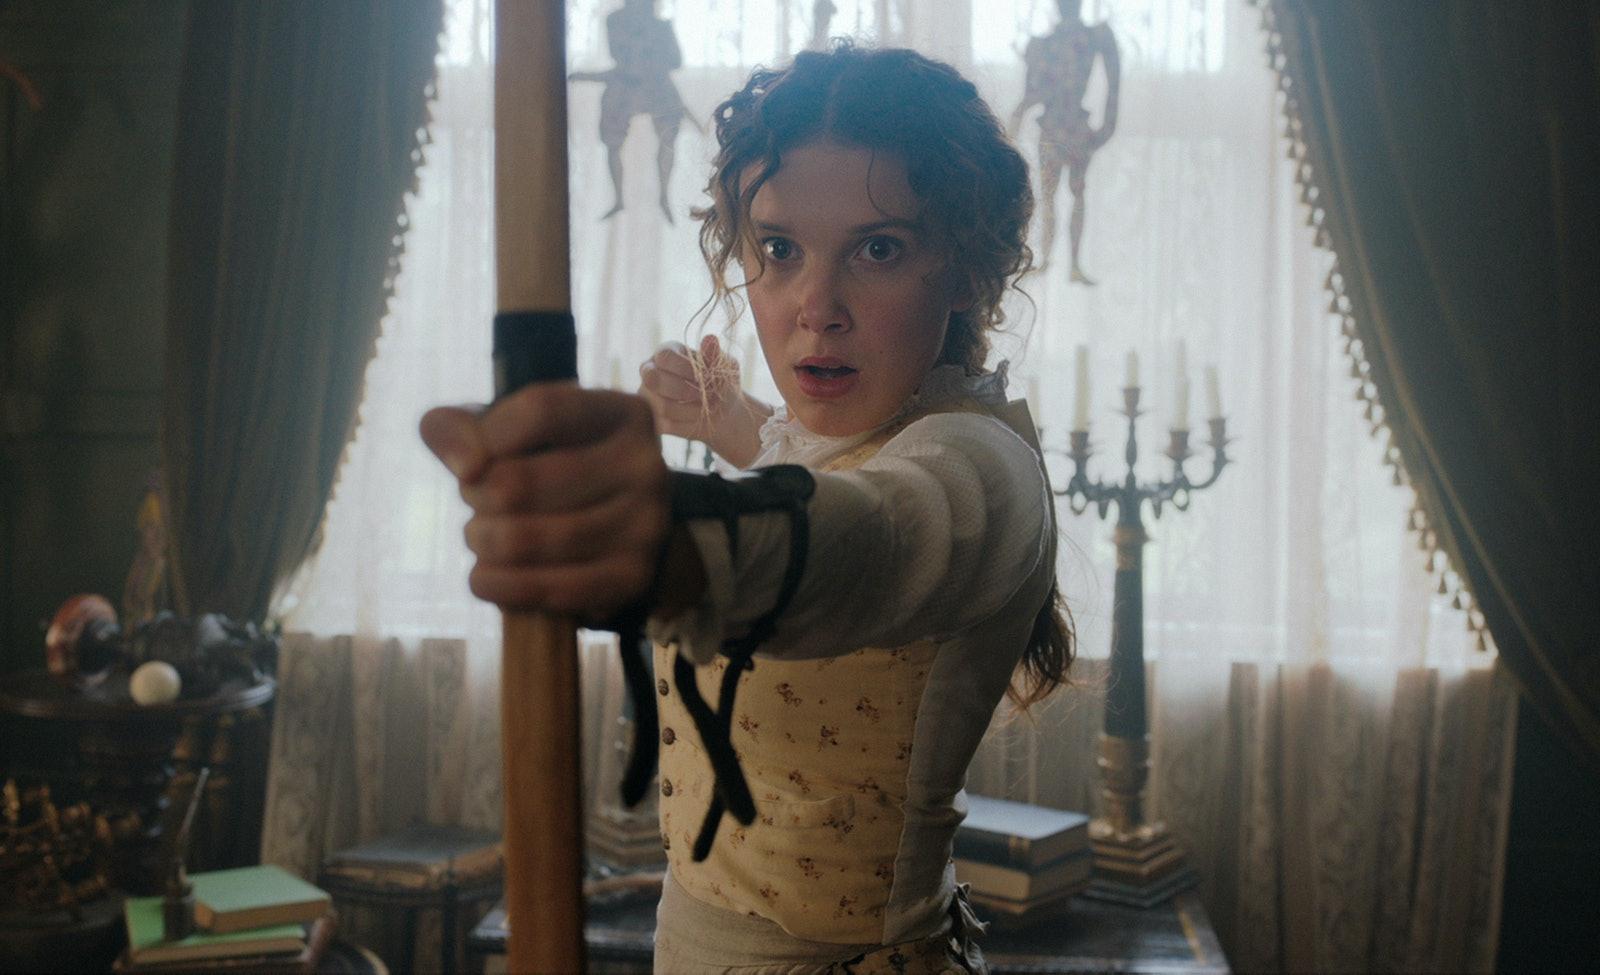 Millie身穿碎花裙挽弓,巾幗不讓鬚眉。